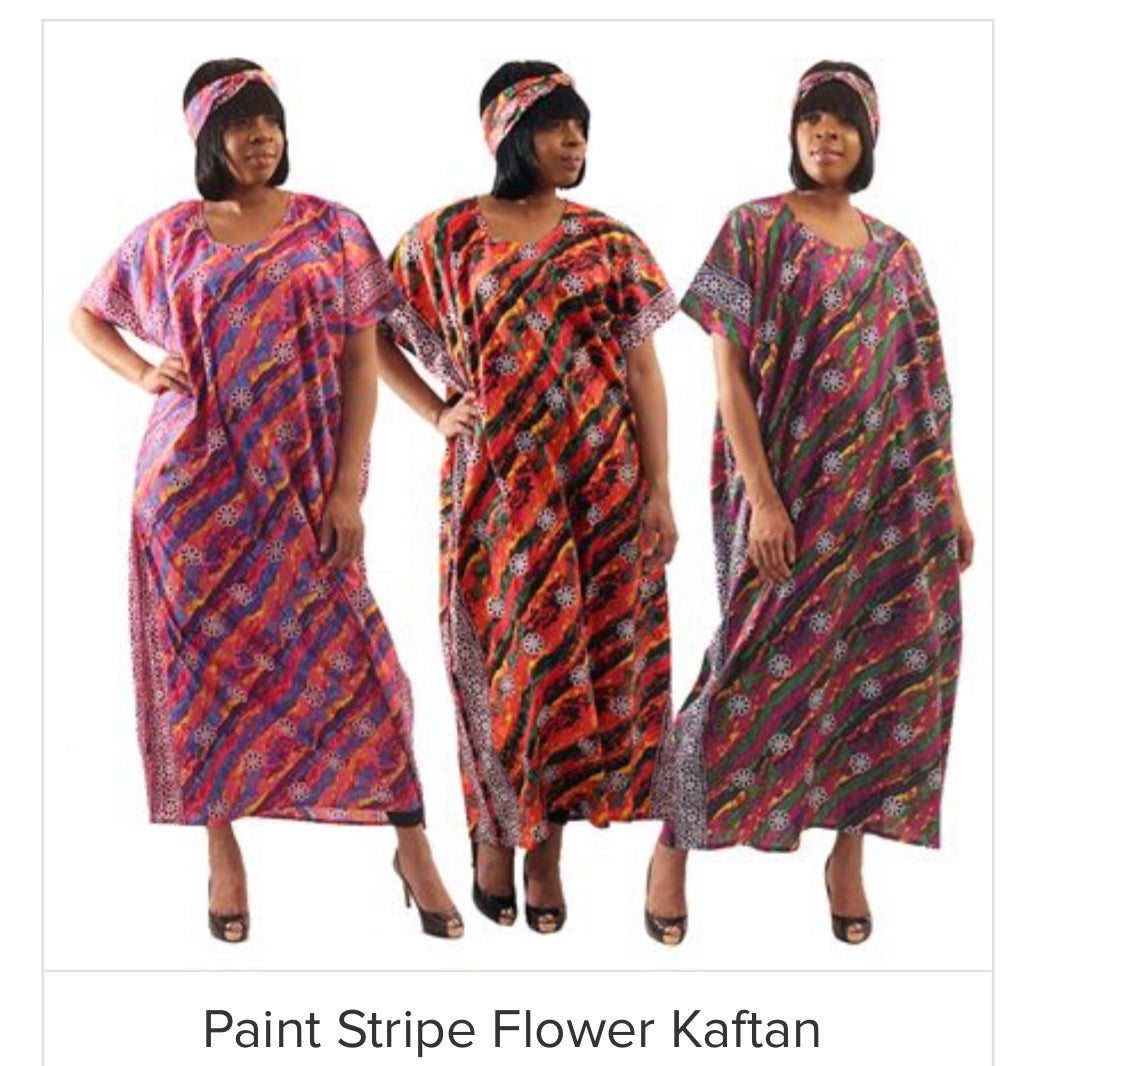 Image of Kaftans